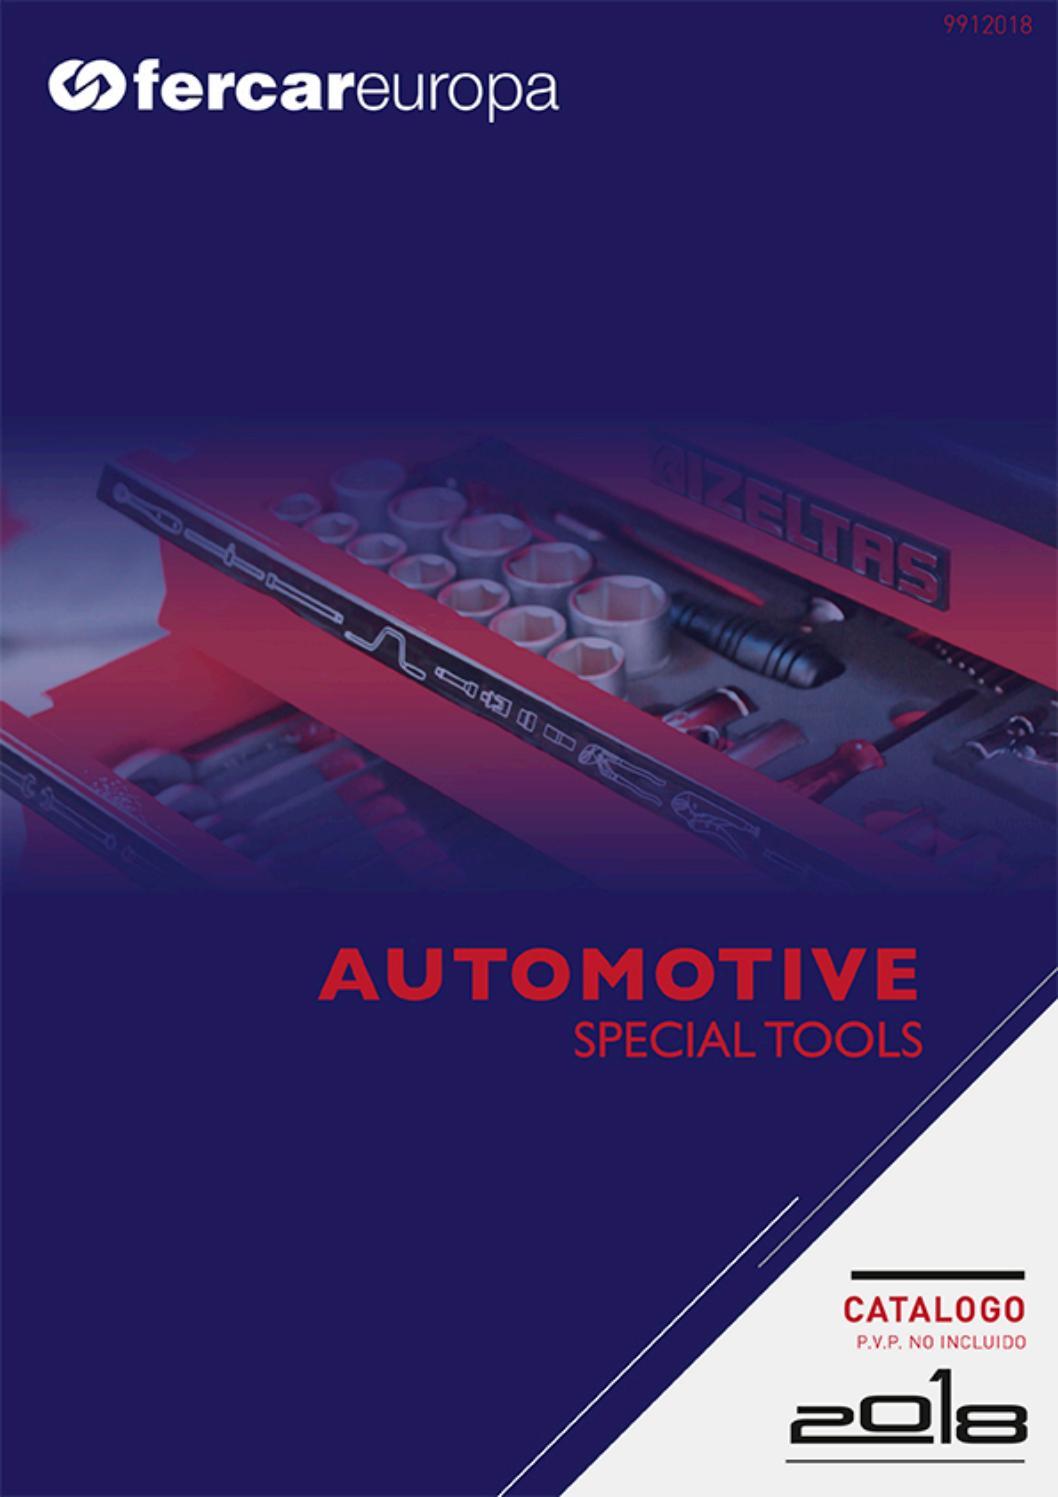 1x Hyundai i30 MK2 2012 1.6 CRDI Motor Regulador De Control Calentador Aleta